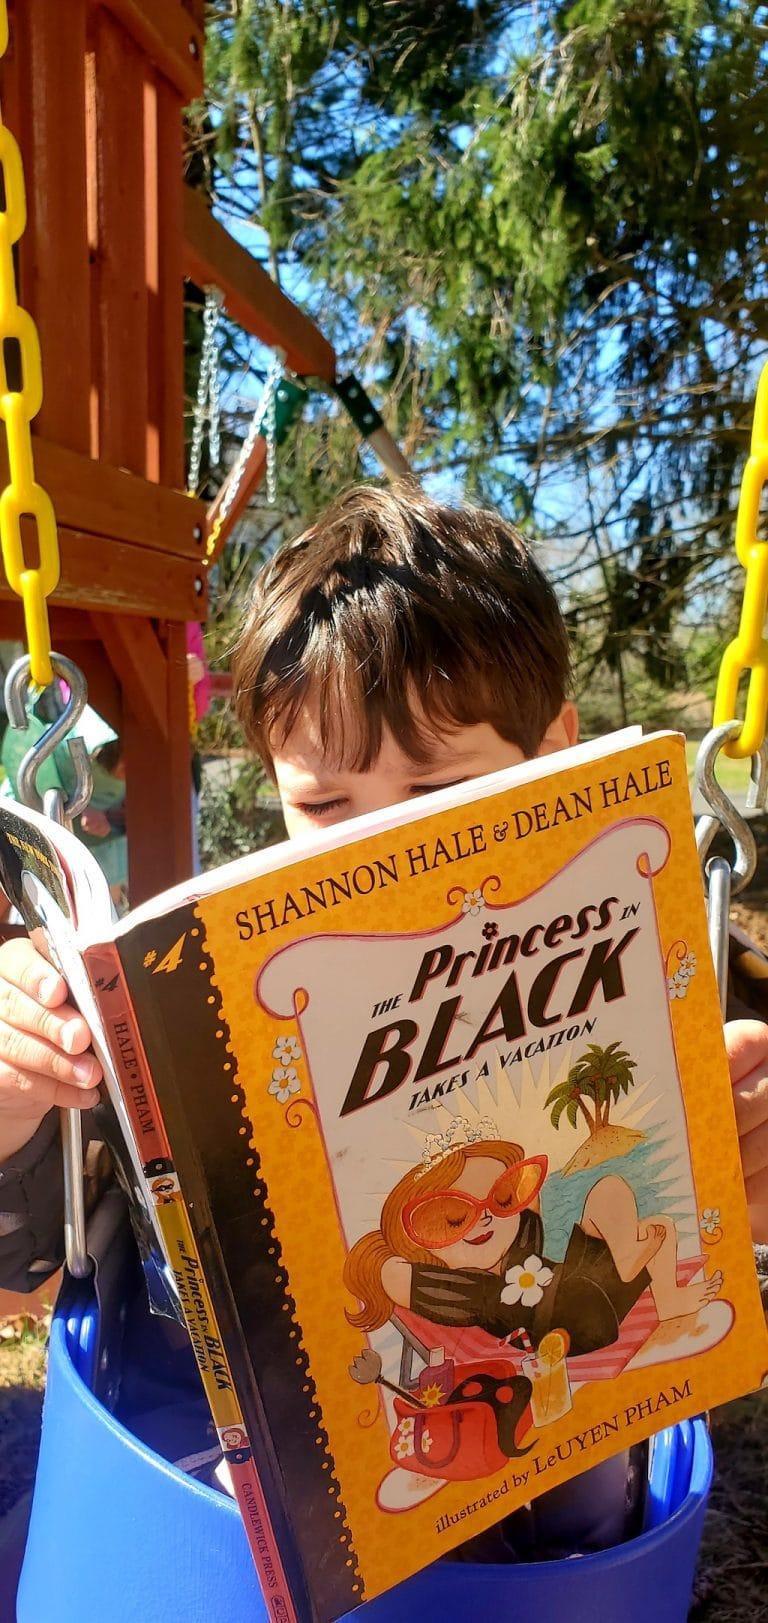 Boy reading princess in black series